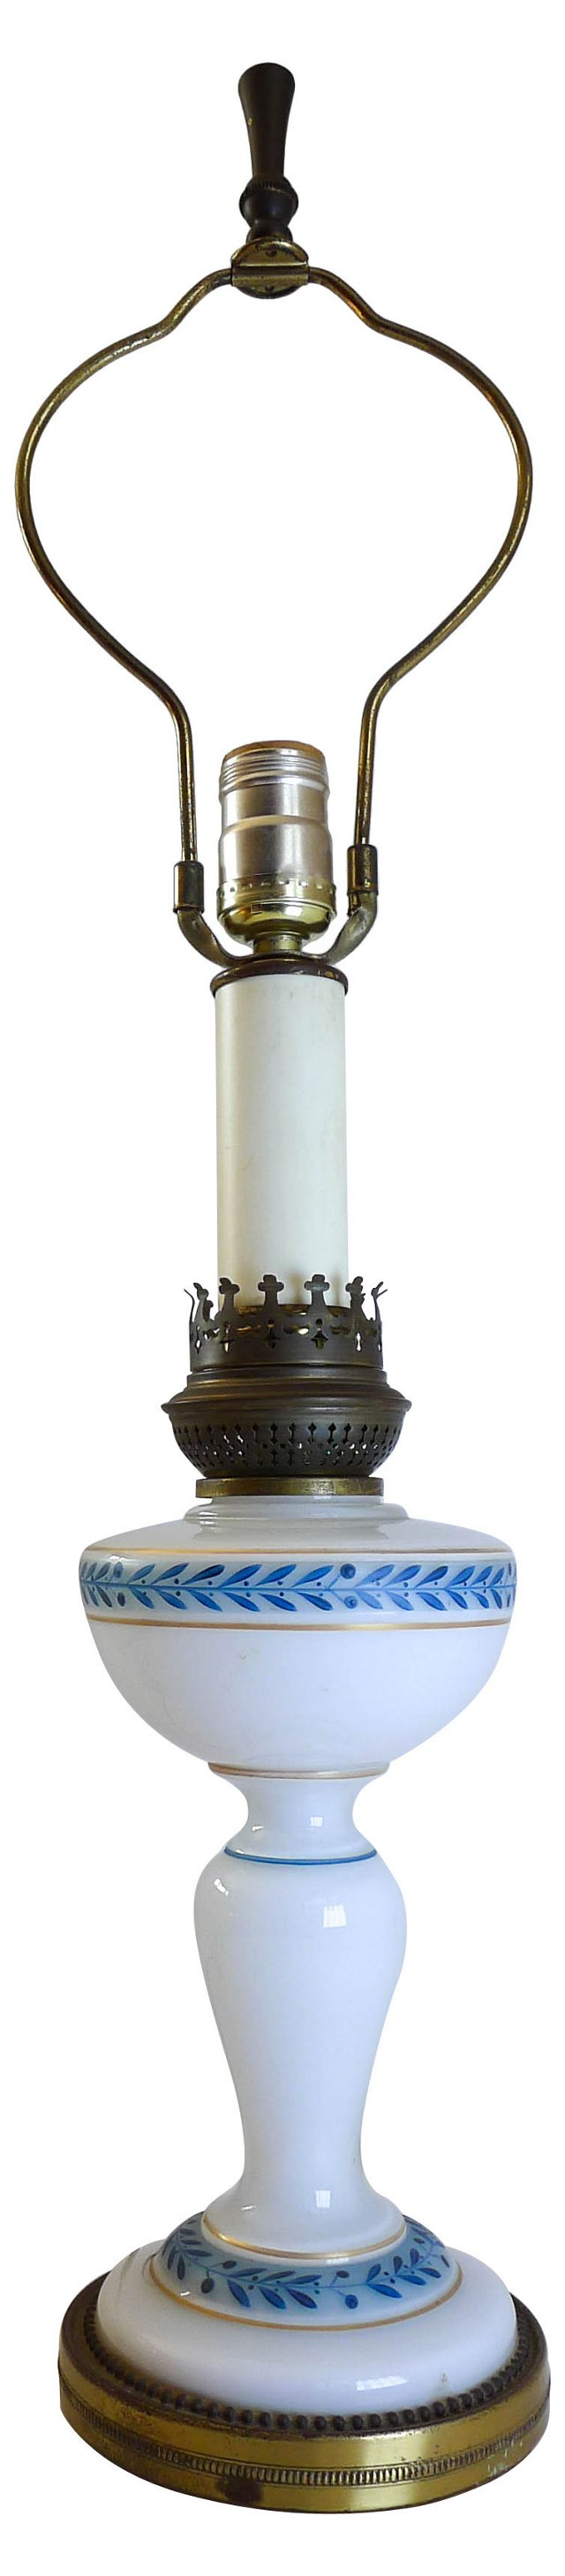 Antique Blue & White Lamp